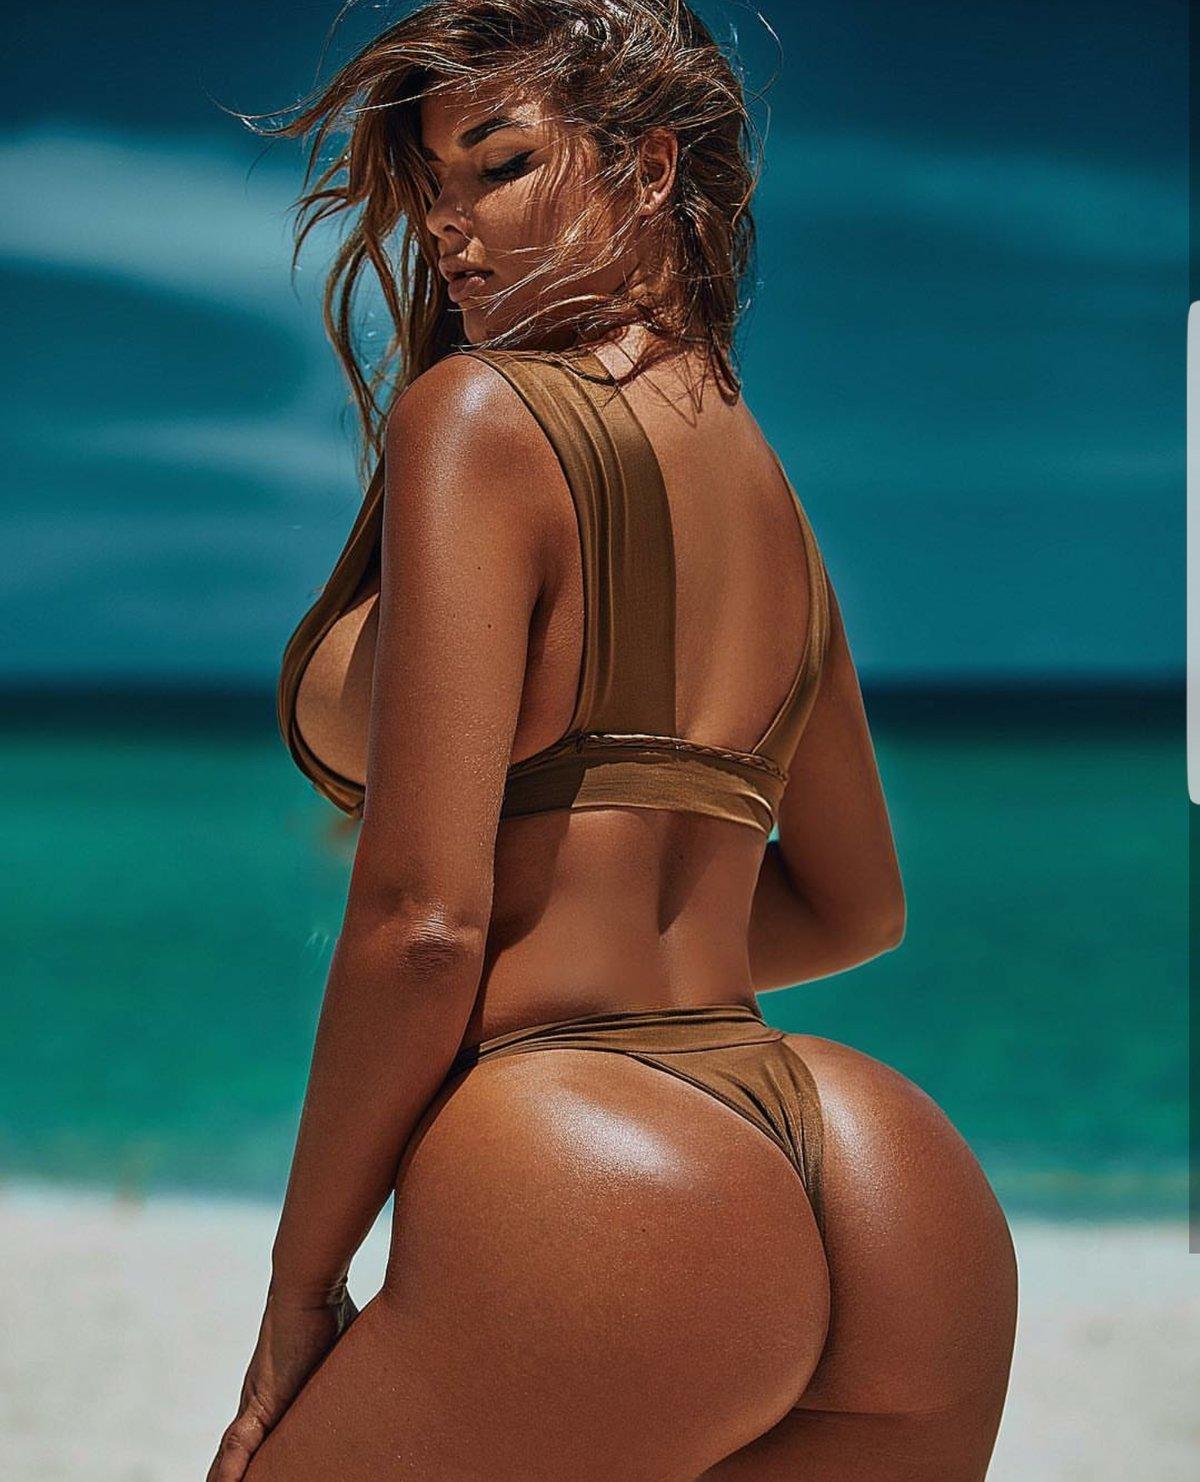 bikini-model-with-great-ass-dbz-girls-nude-pics